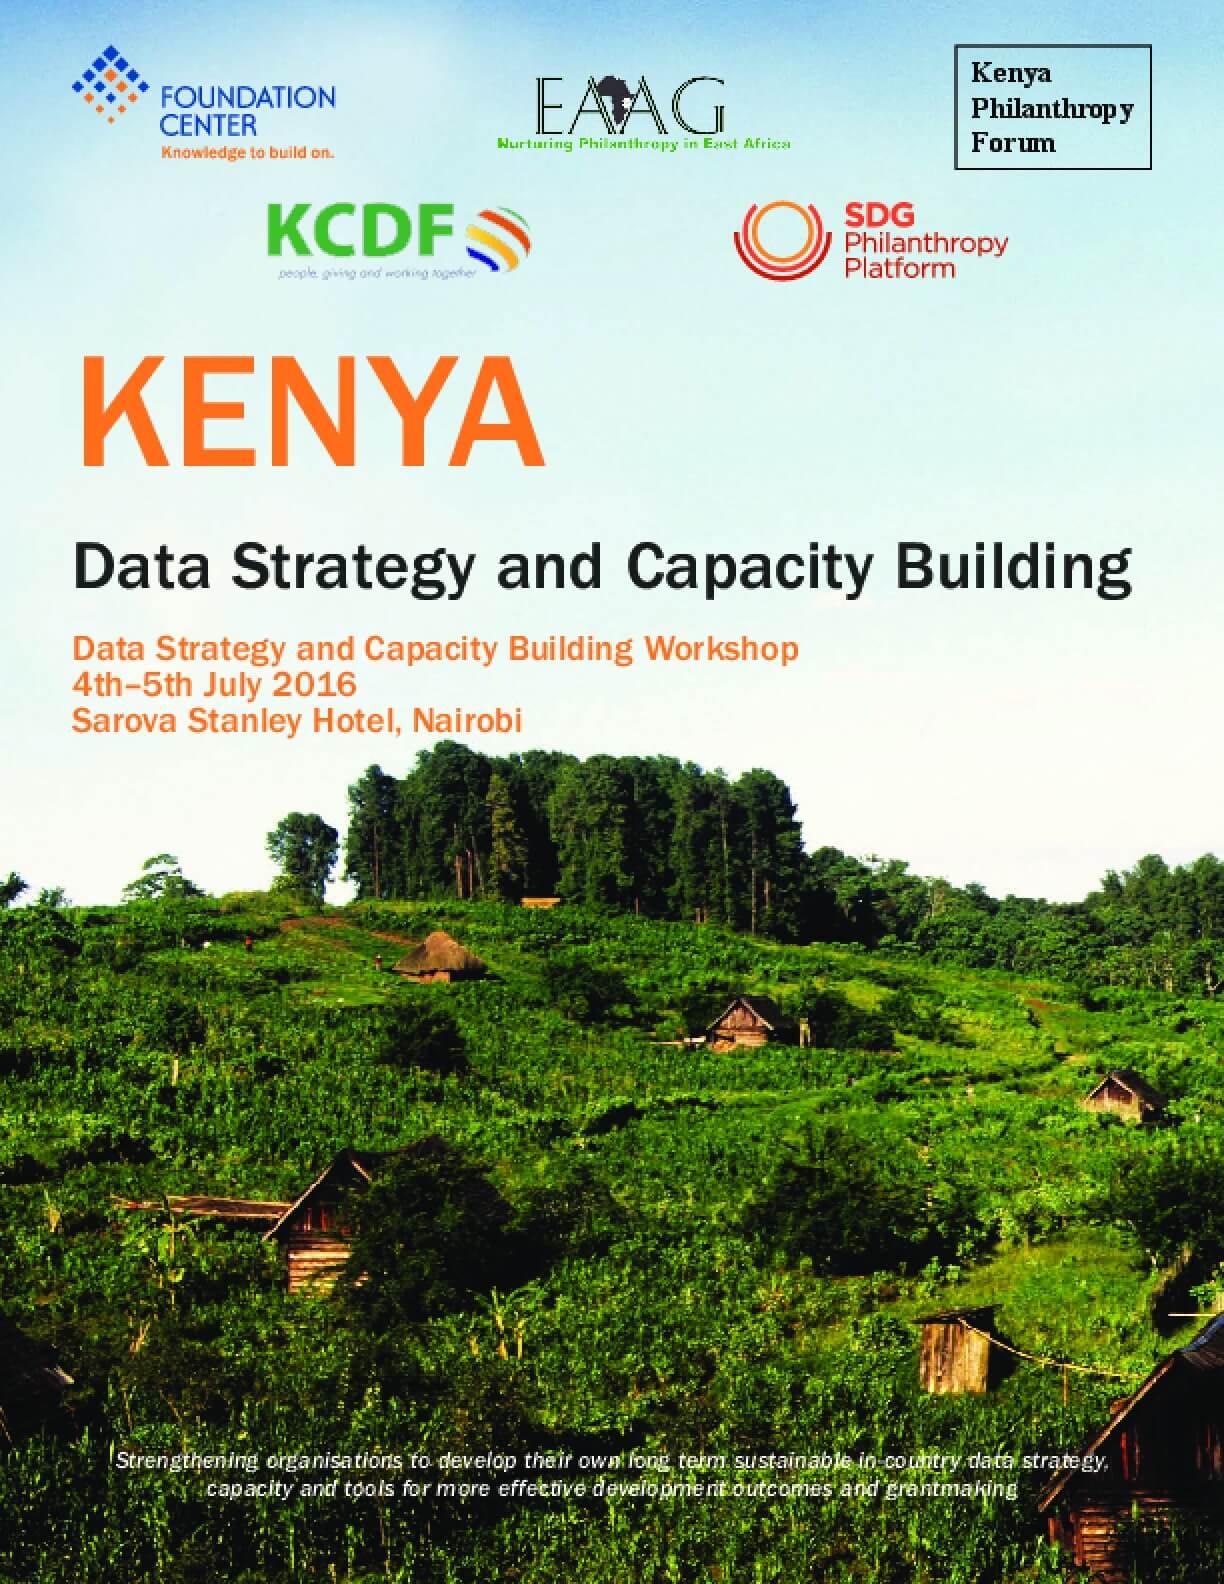 Kenya Data Strategy and Capacity Building: Data Strategy and Capacity Building Workshop